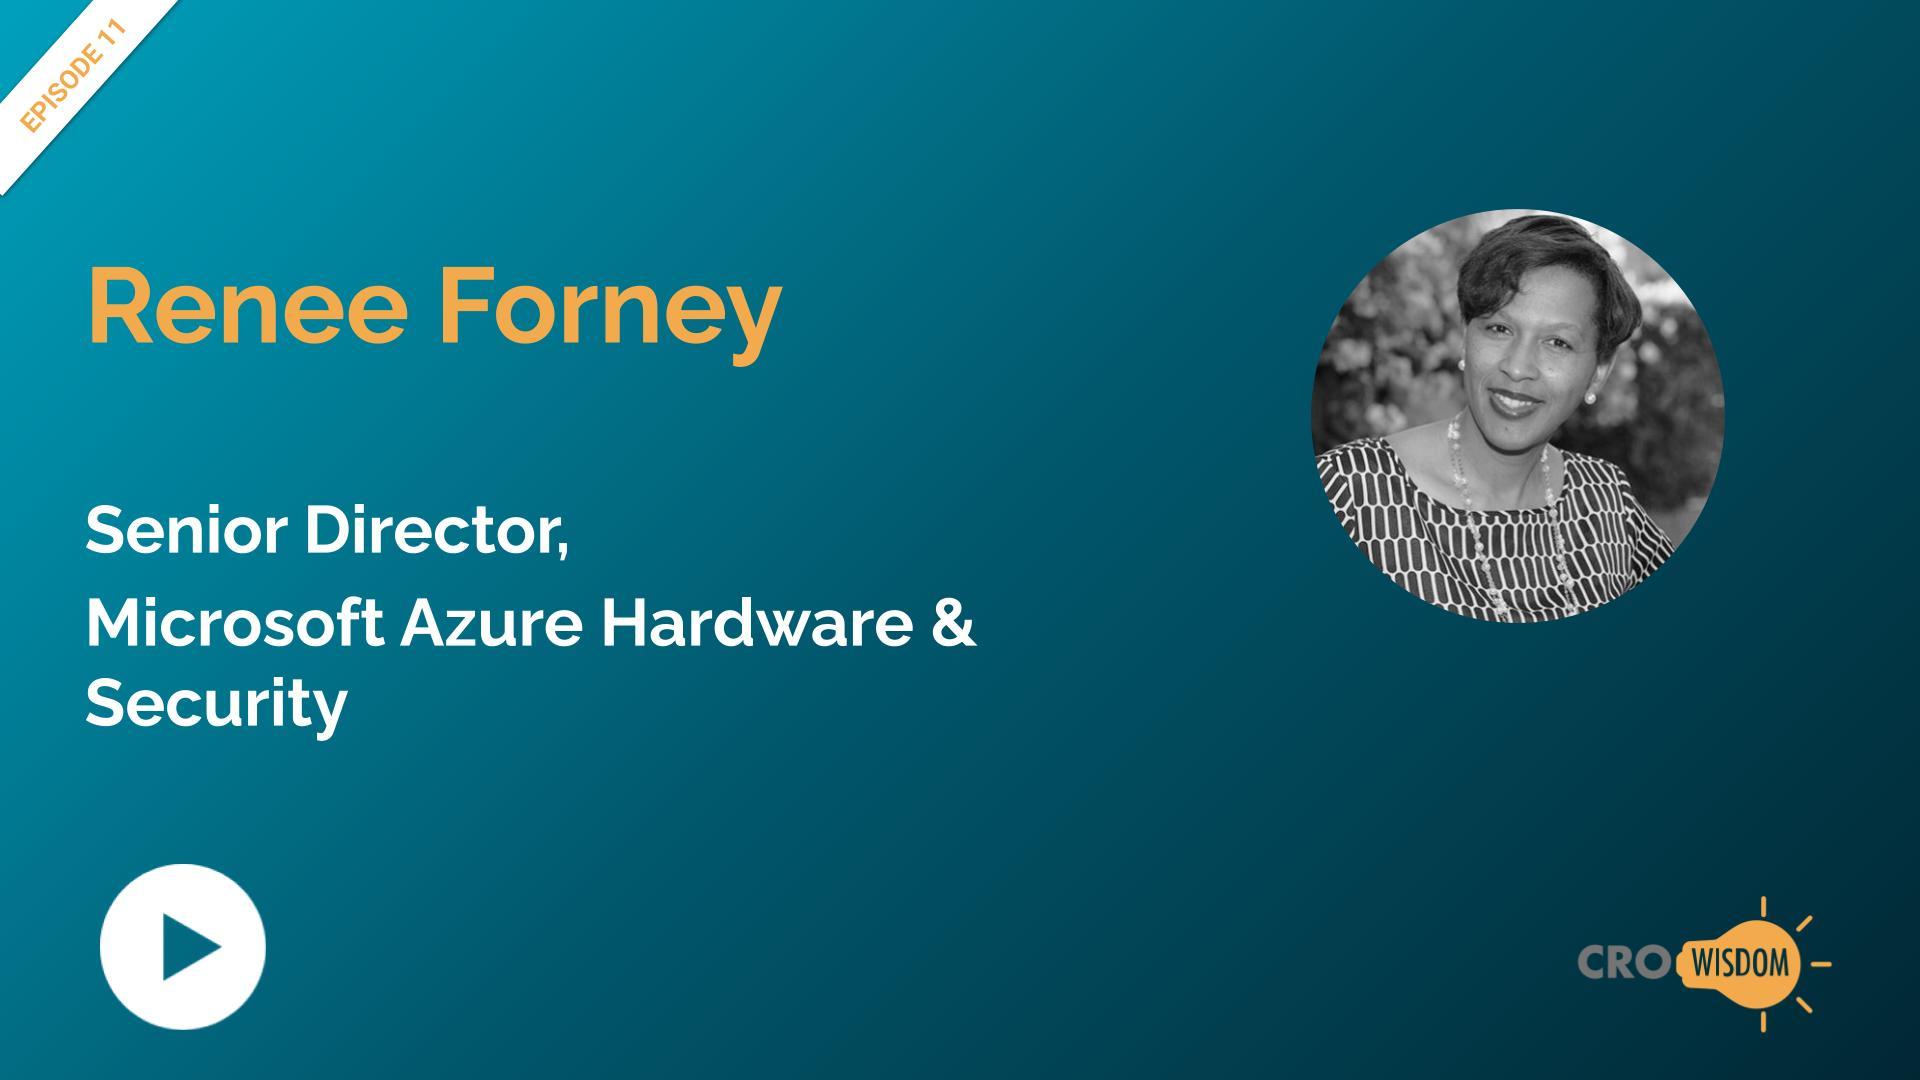 CRO Wisdom Episode 11 with Renee Forney, Senior Director - Azure Hardware & Security, Microsoft